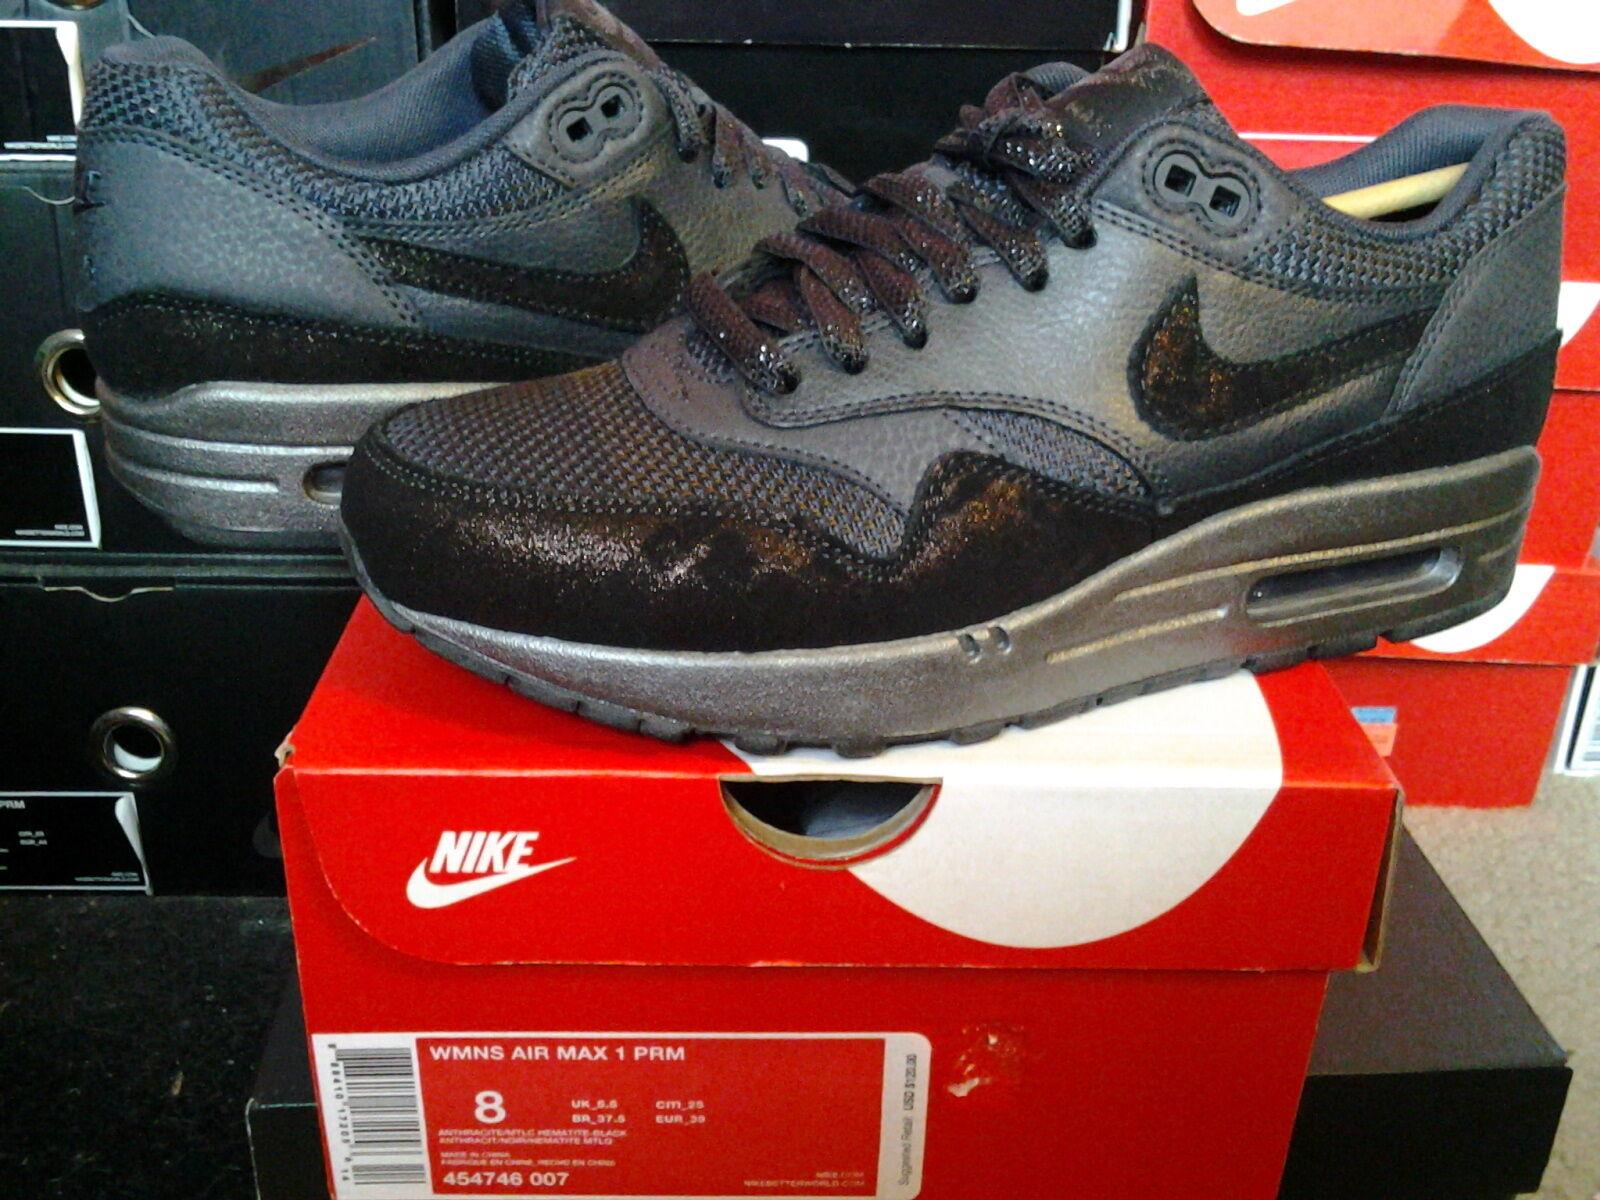 Womens Nike Nike Nike Air Max 1 Premium PRM Anthracite Metallic Hematite Black 454746 007 c9946a